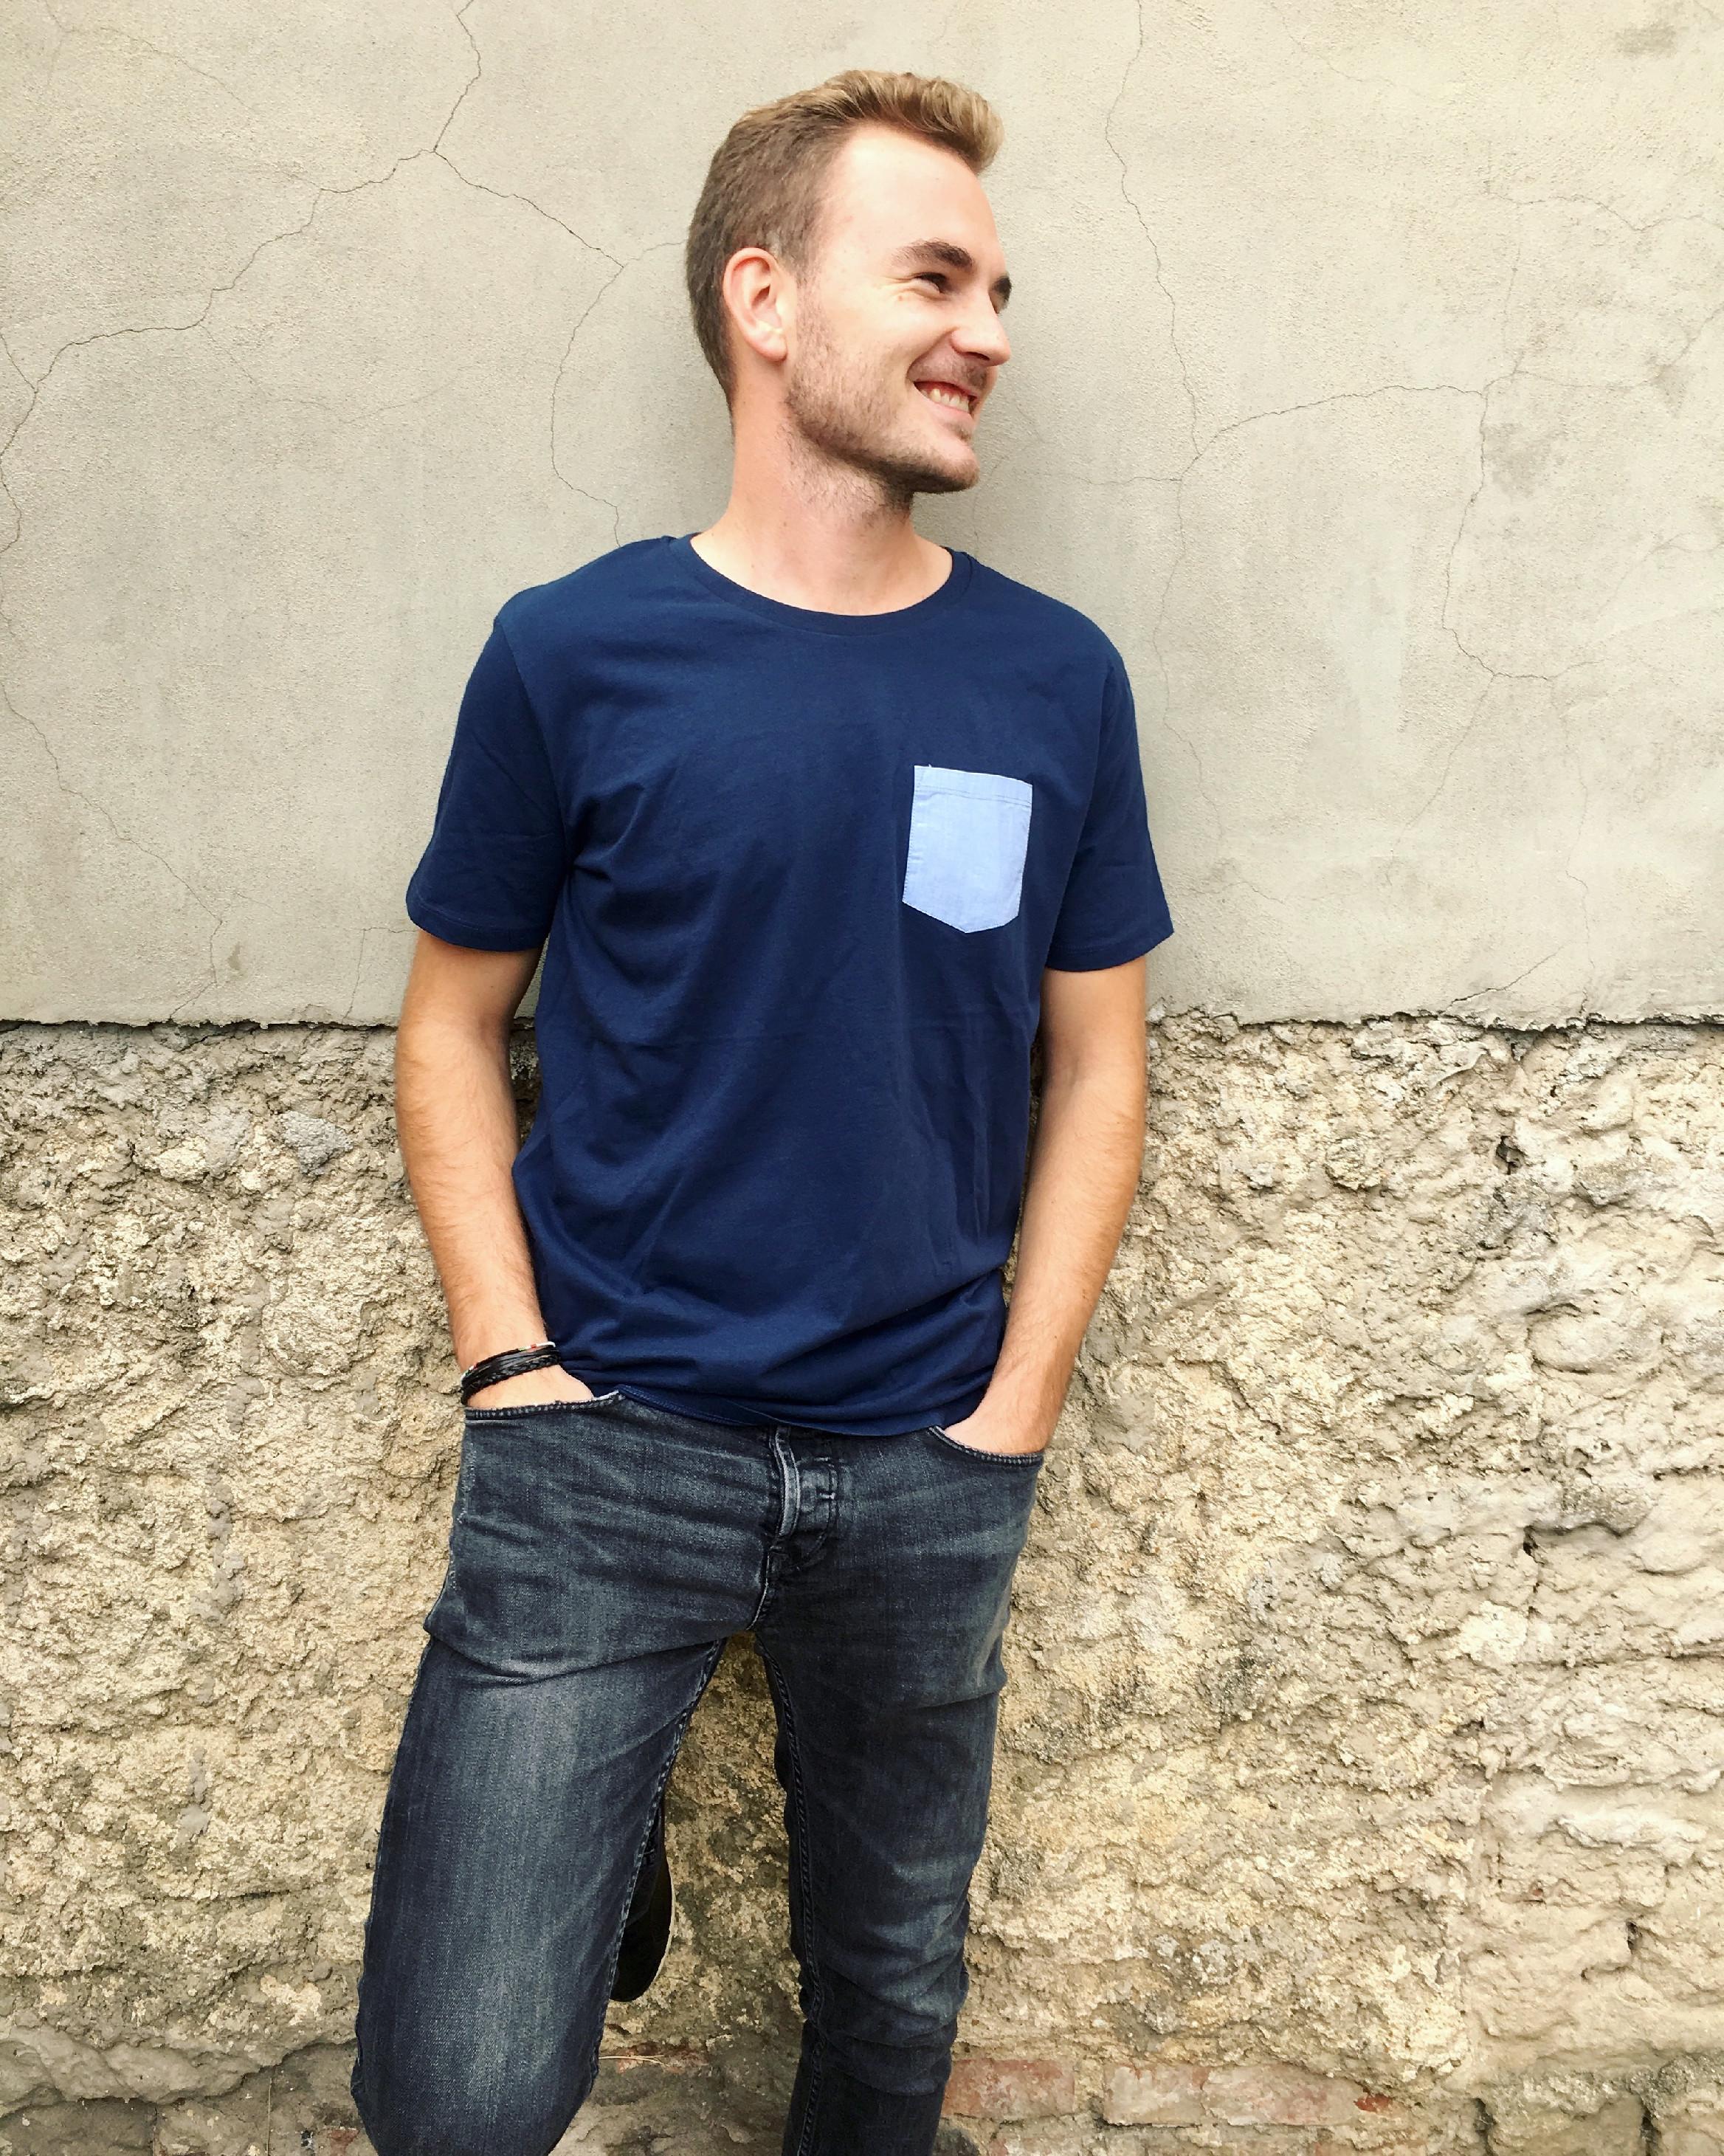 6c1202efae1 Pánské triko s kapsou Barva  Tmavě modrá